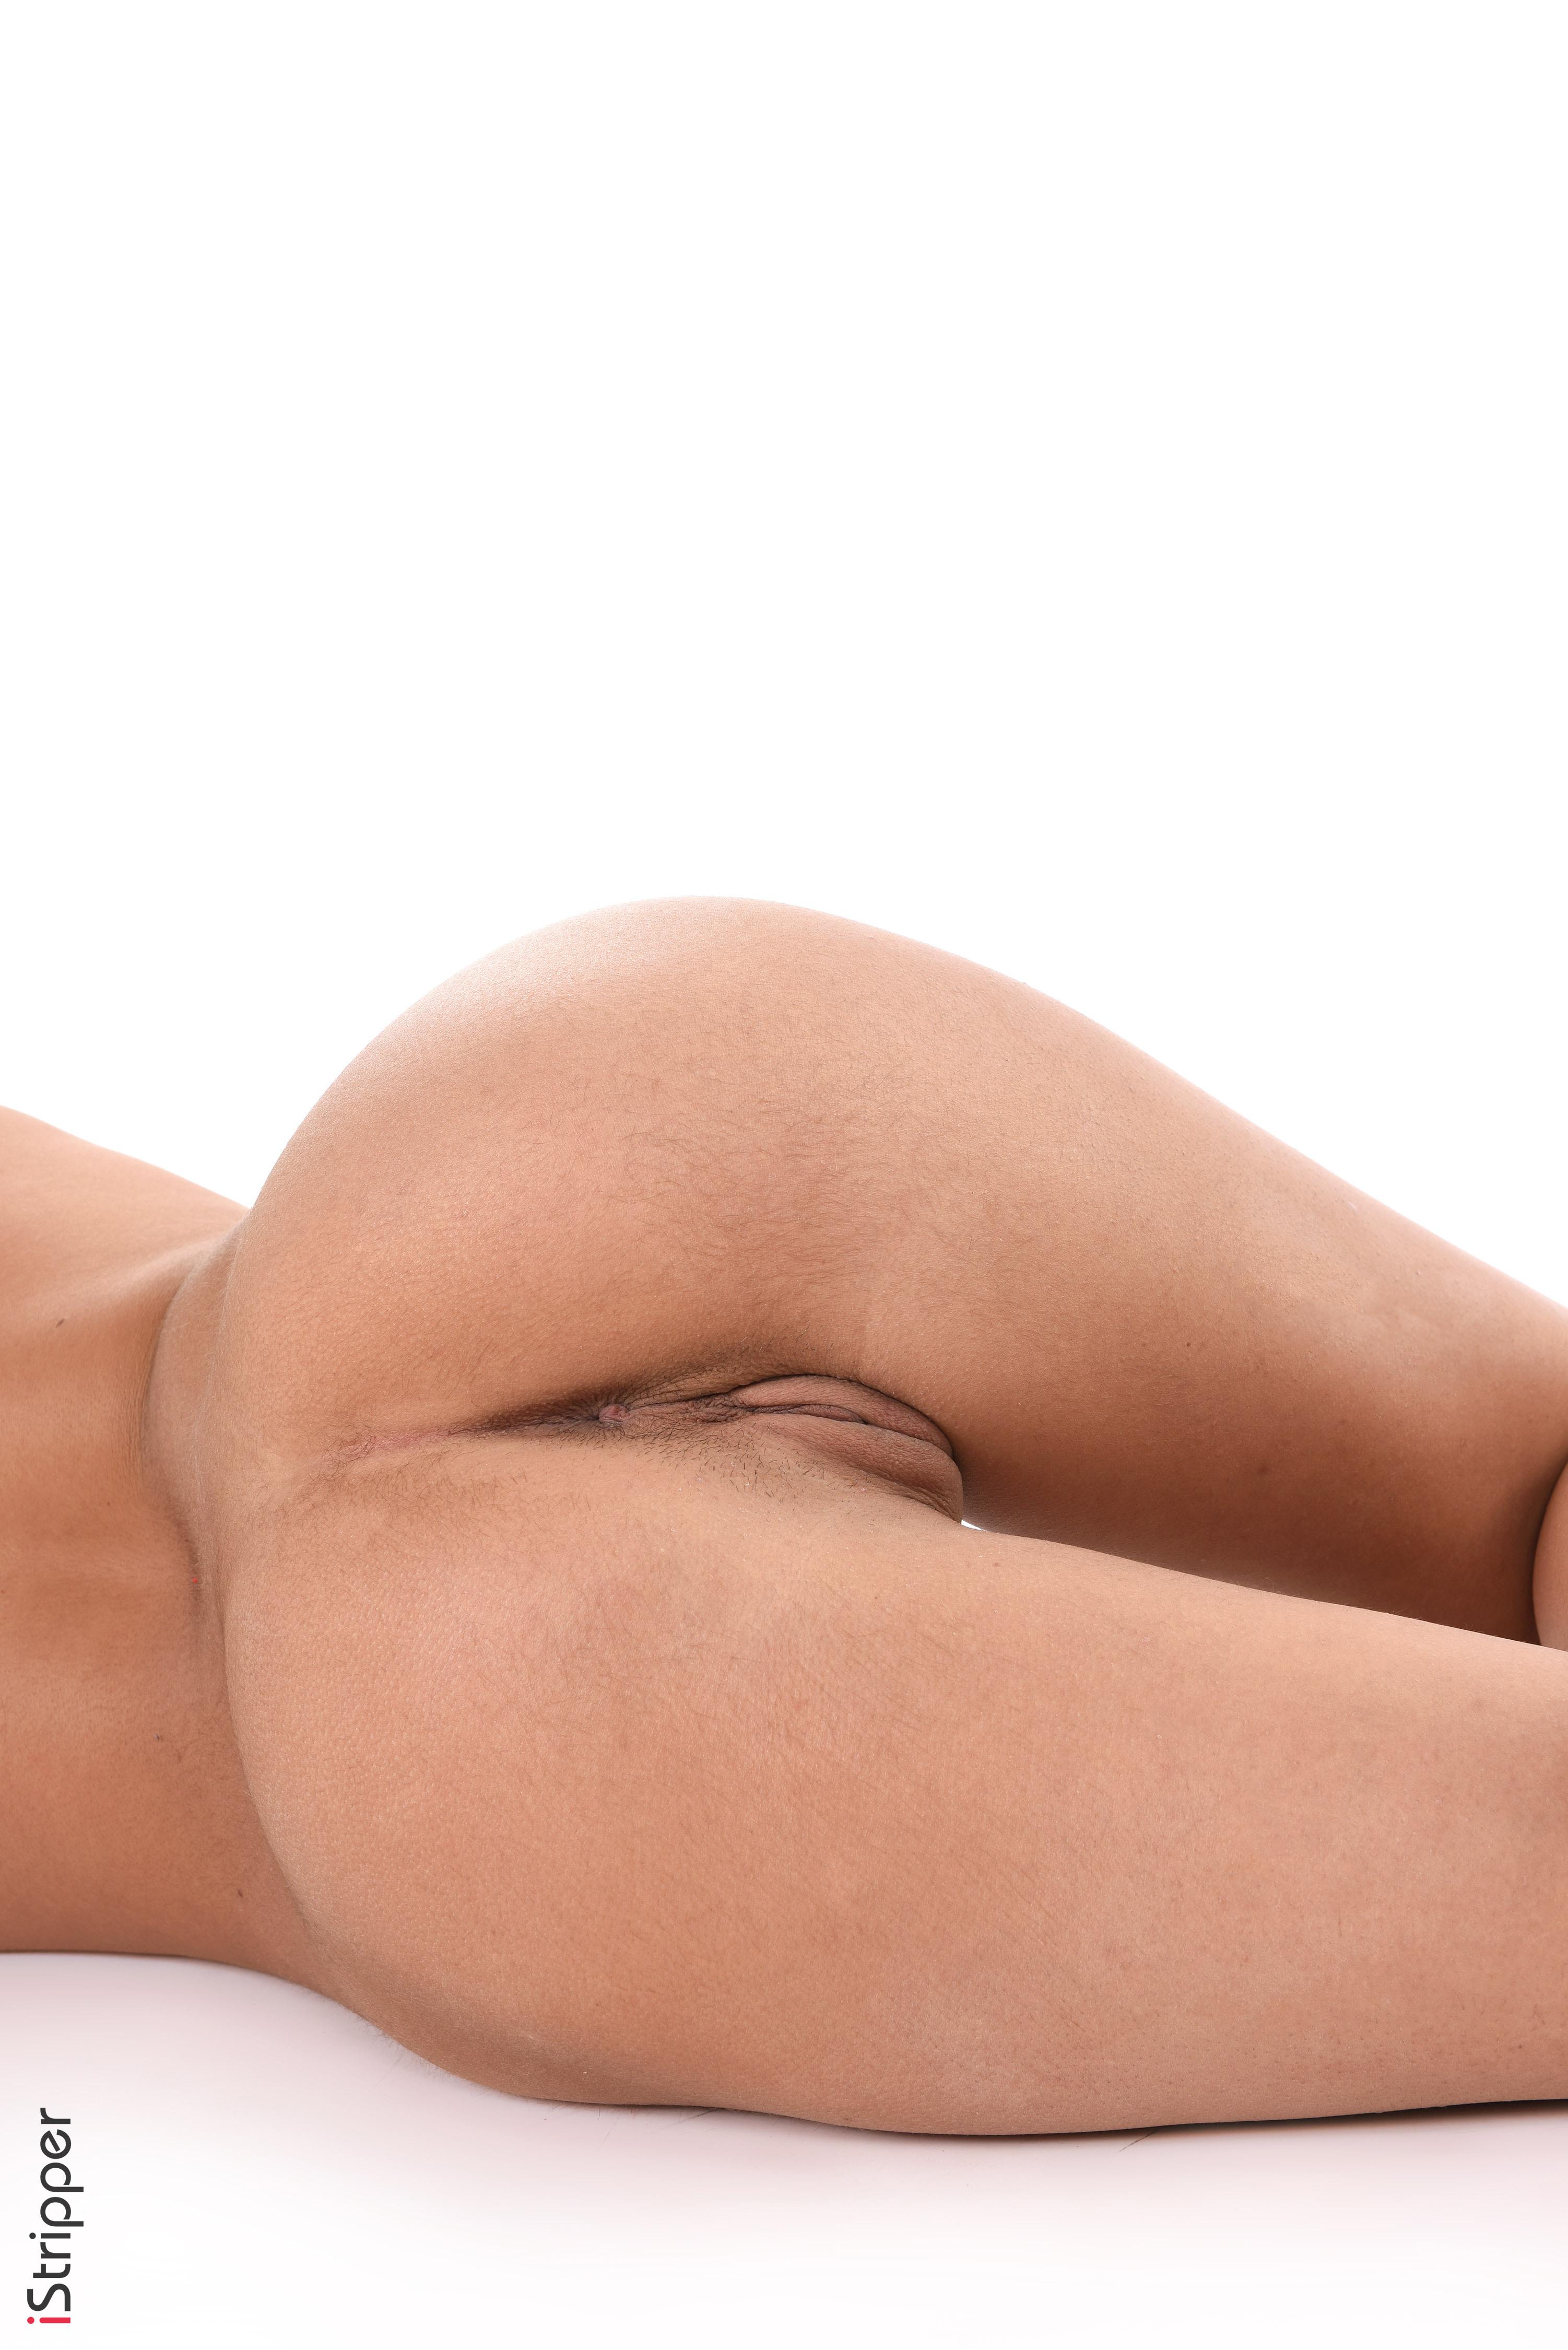 brittany oconnelclc 4 dtljadastevens wmvfulllow 2 erotic striptease sexy g